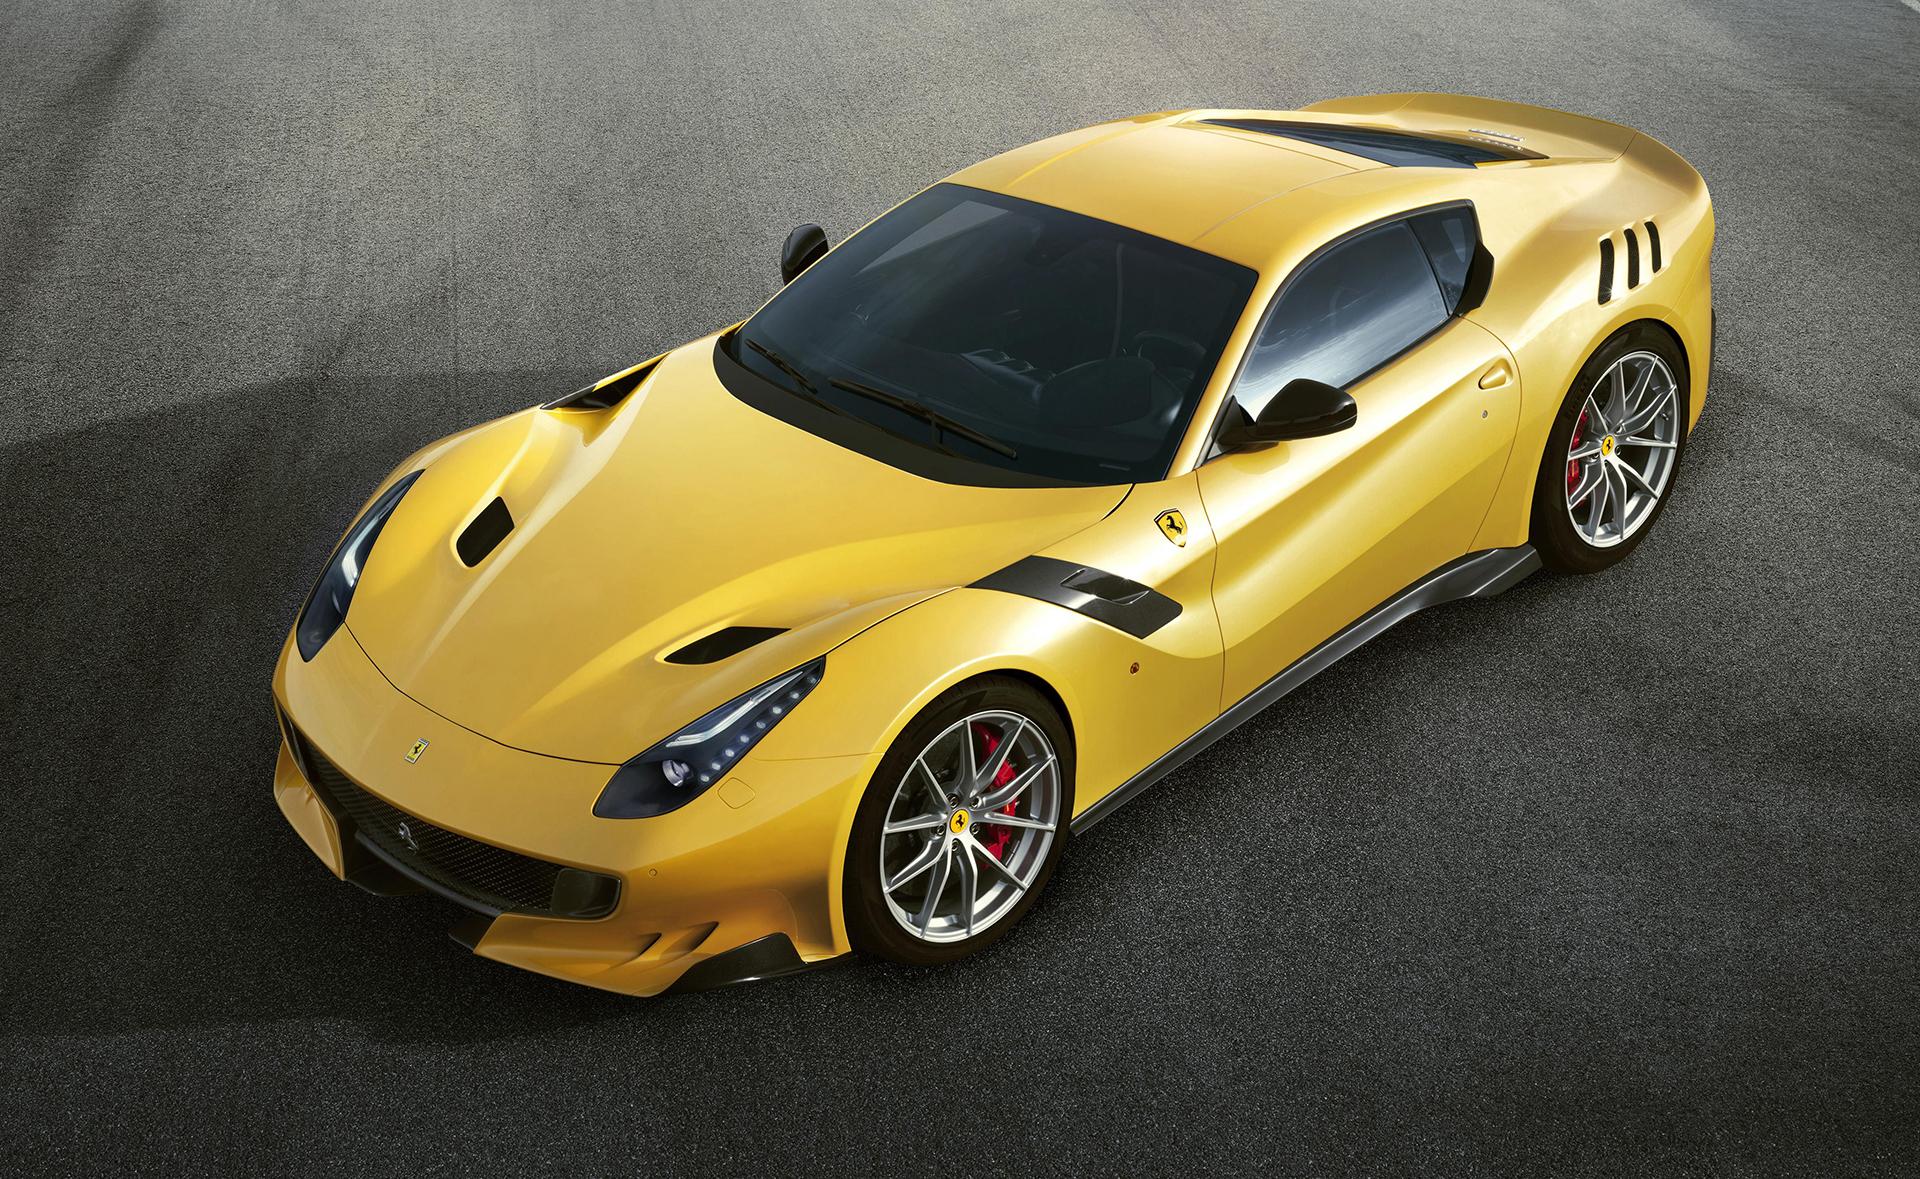 Ferrari F12tdf - profil avant / front side-face